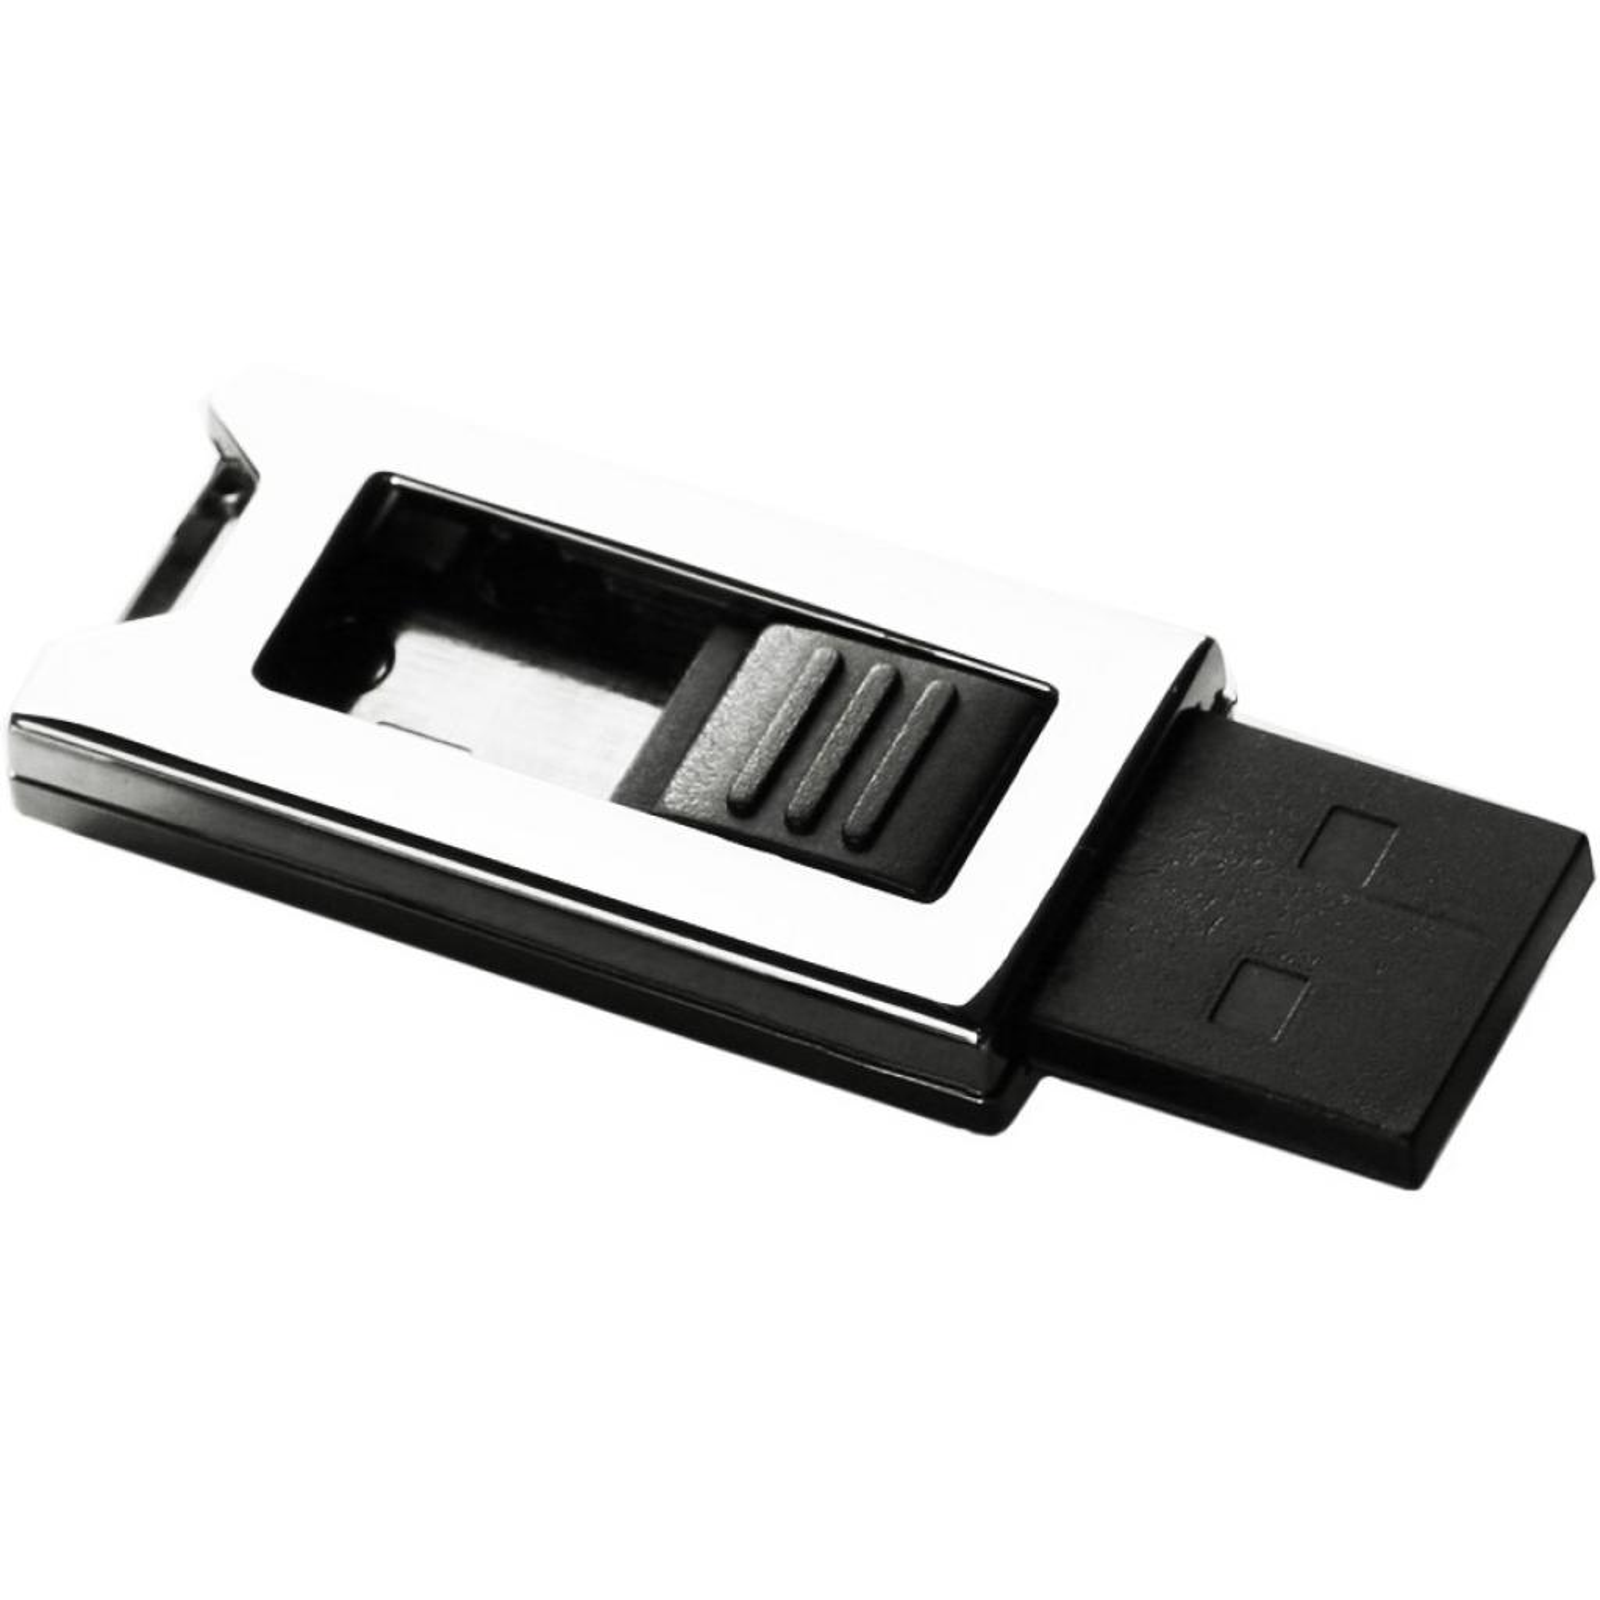 USB флеш накопитель Silicon Power 16Gb Touch 850 titanium (SP016GBUF2850V1T) изображение 4